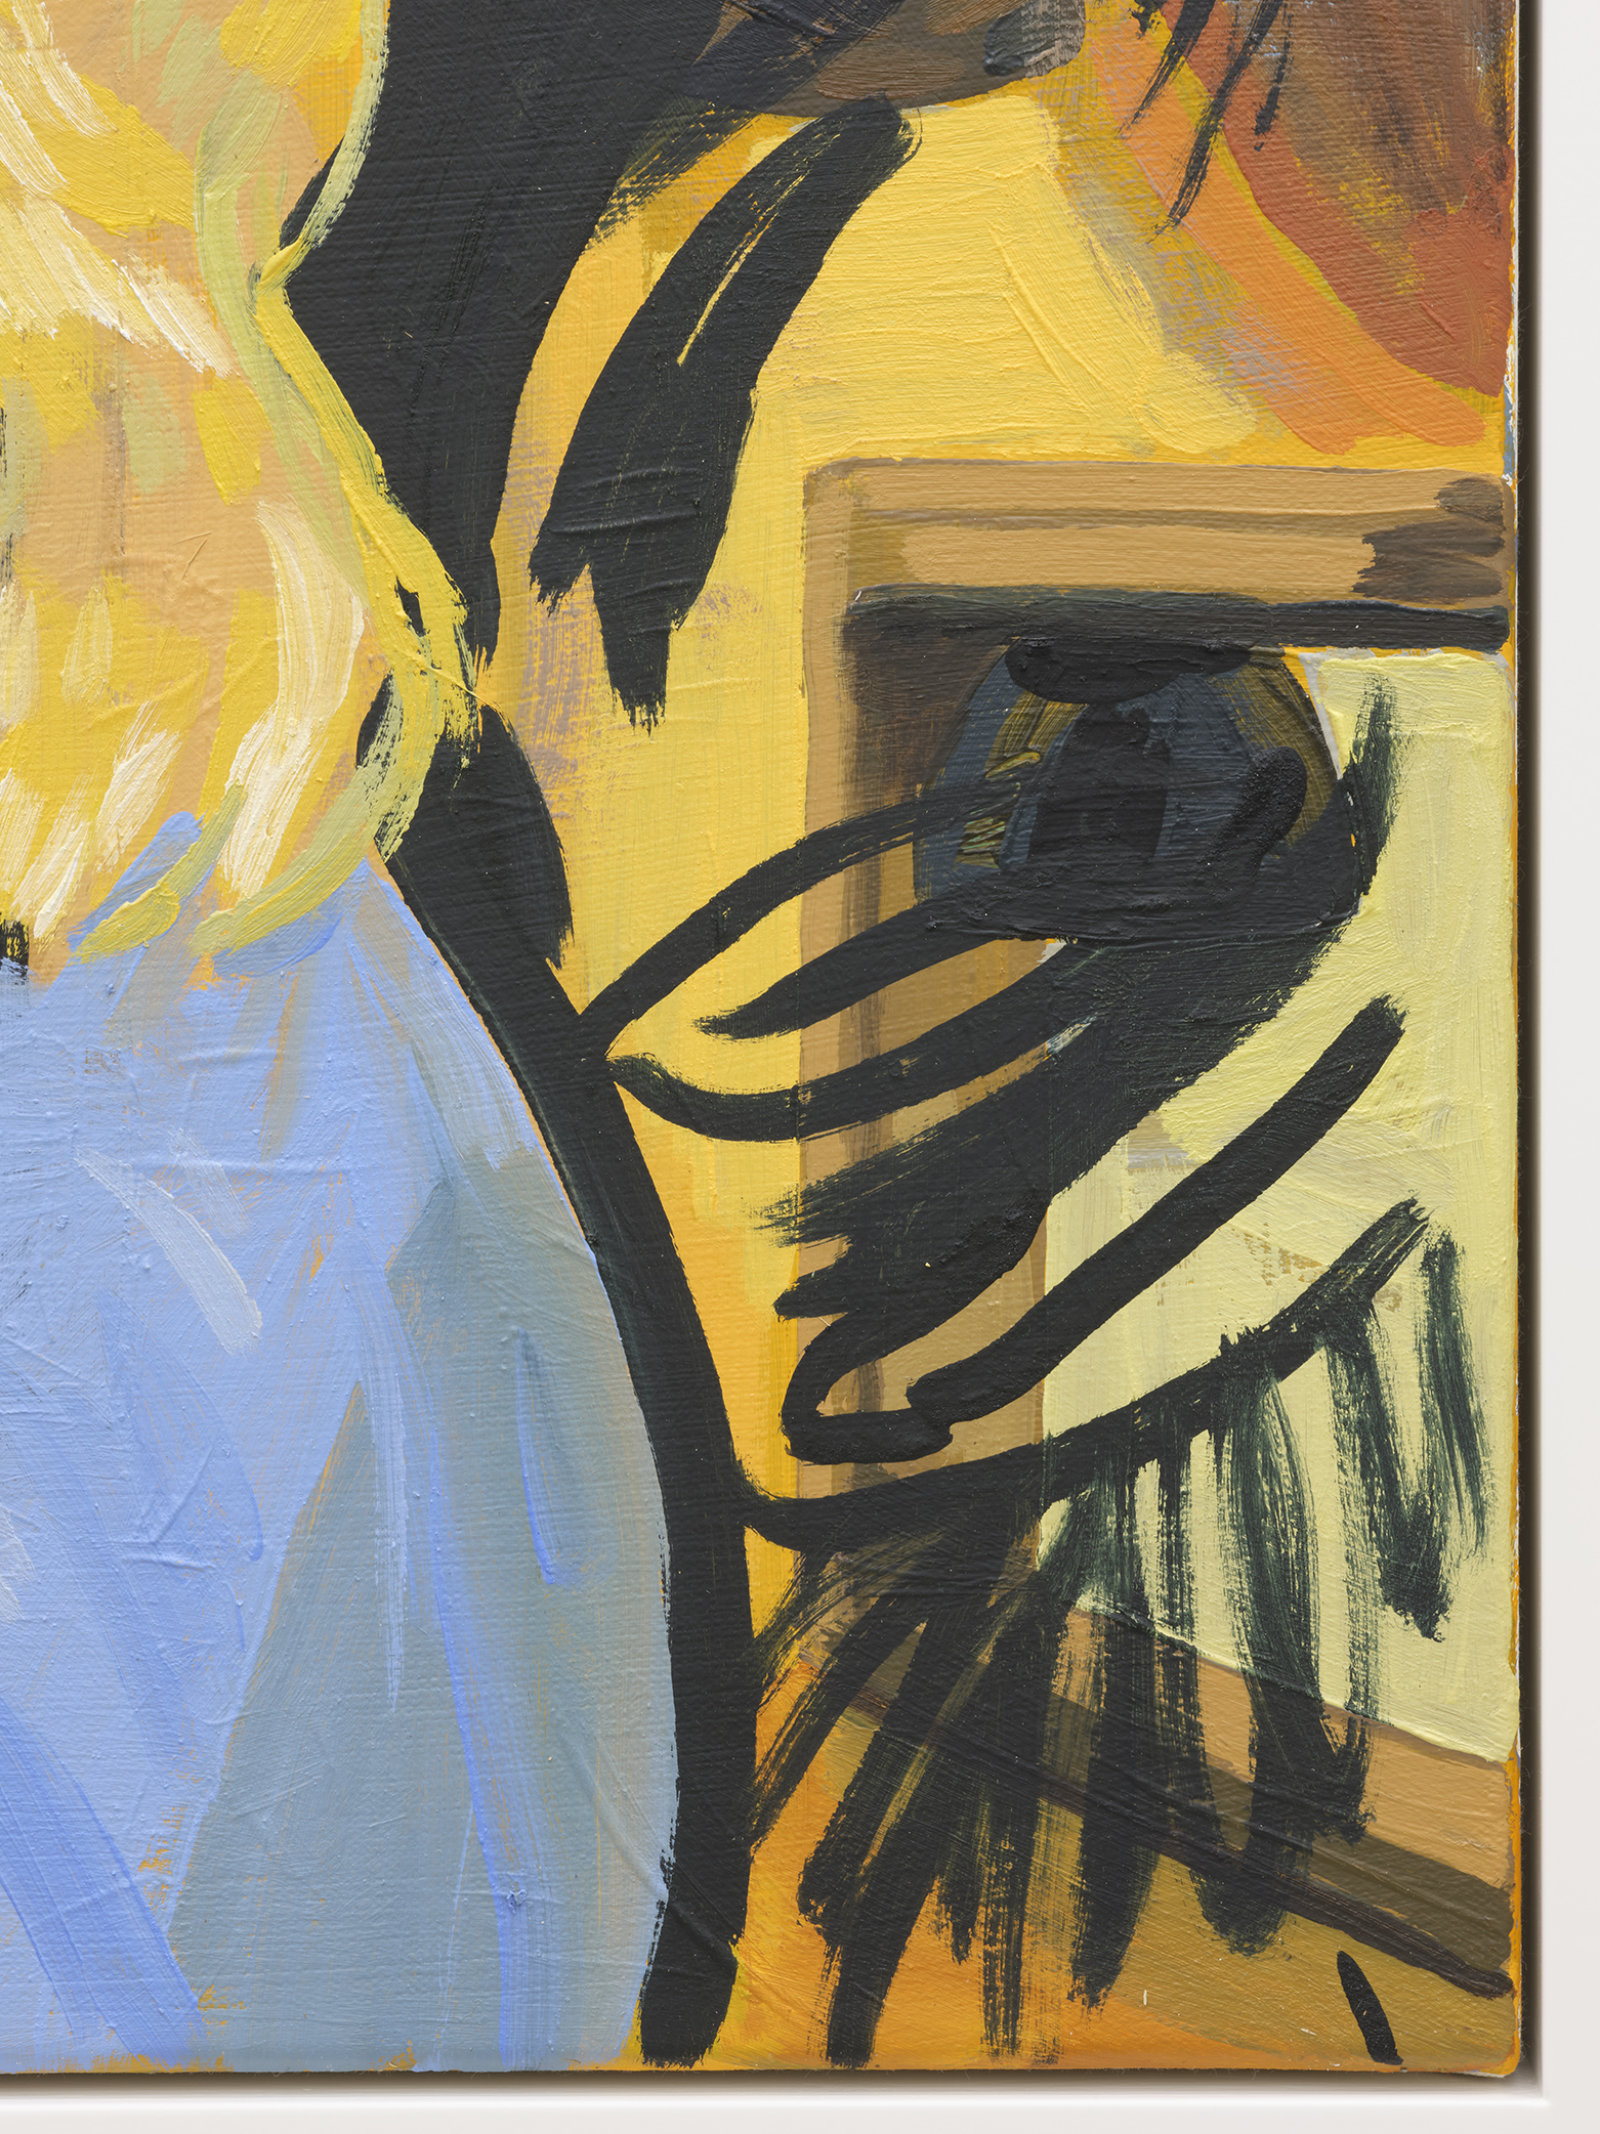 Damian Moppett, Small Party (detail), 2020, oil on canvas, 30 x 33 in. (76 x 84 cm) by Damian Moppett